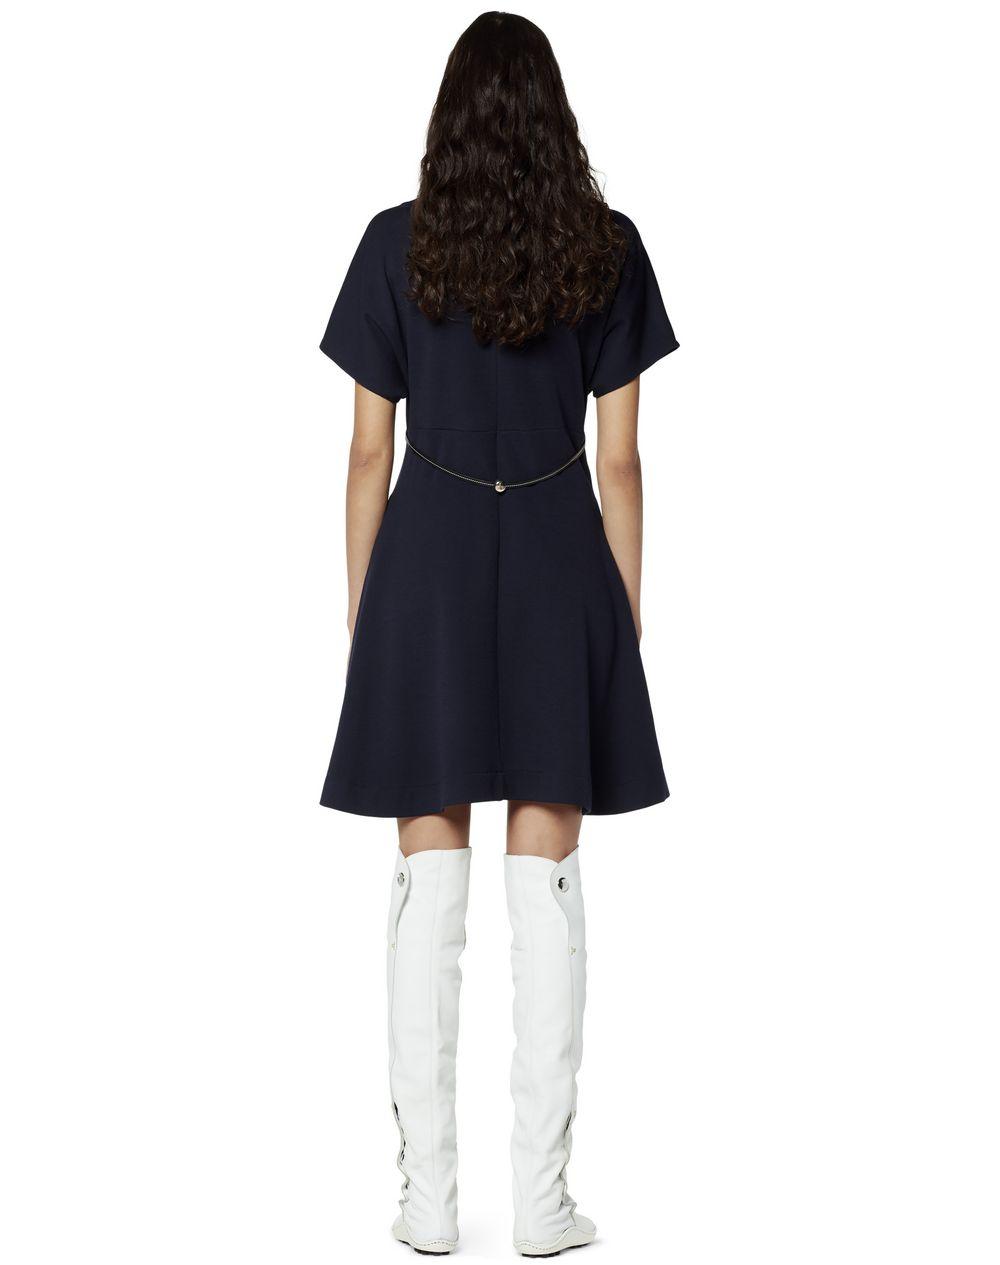 NAVY BLUE JERSEY DRESS - Lanvin